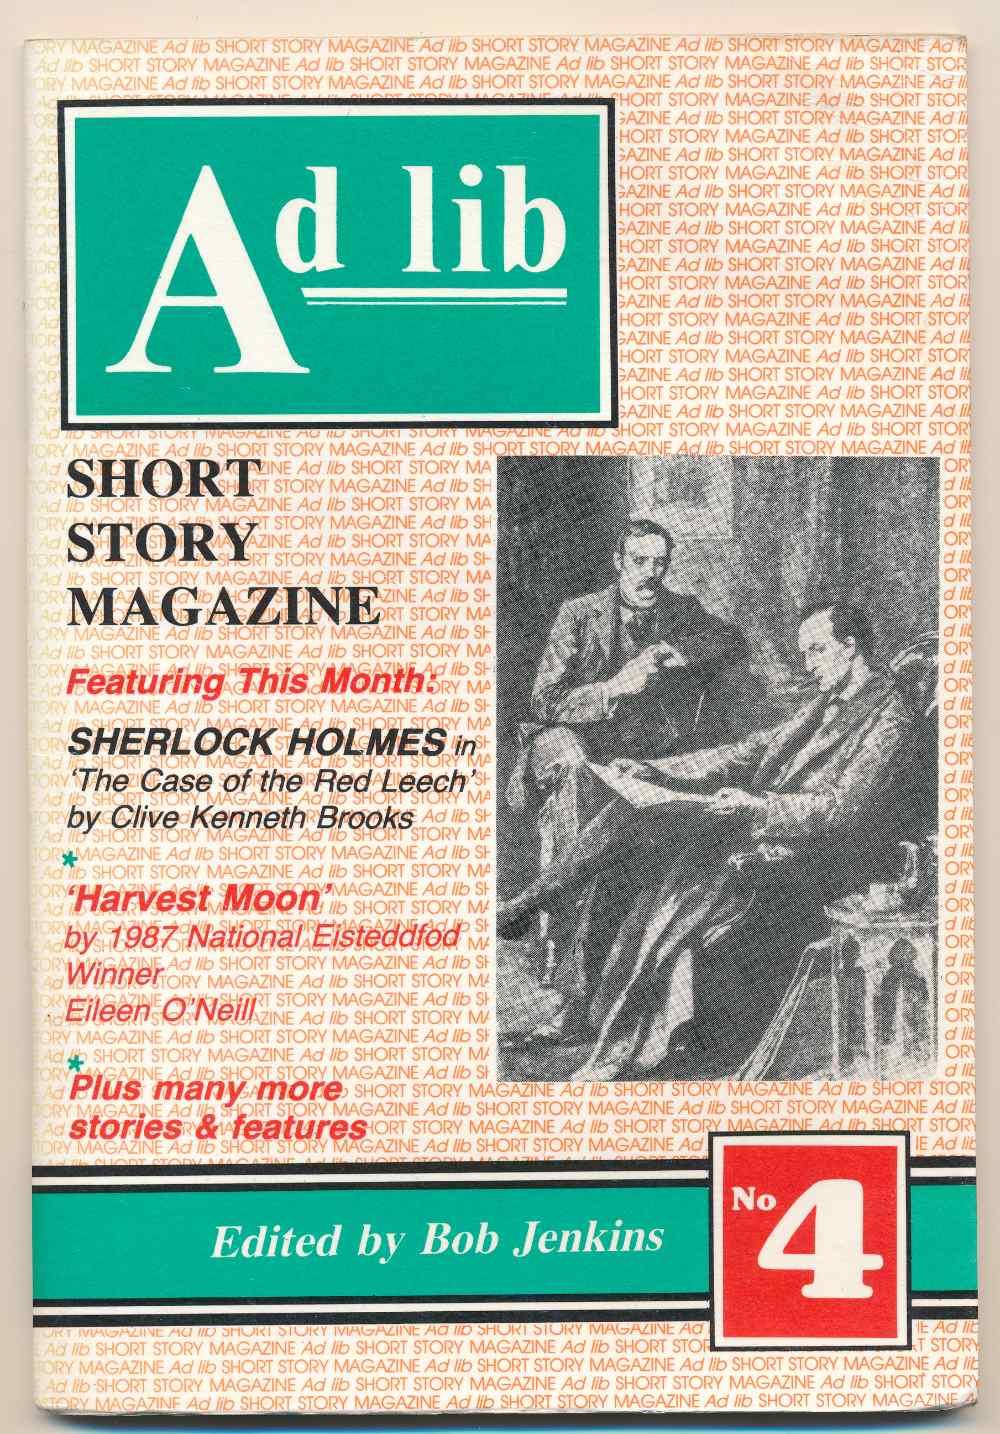 Ad lib Short Story Magazine